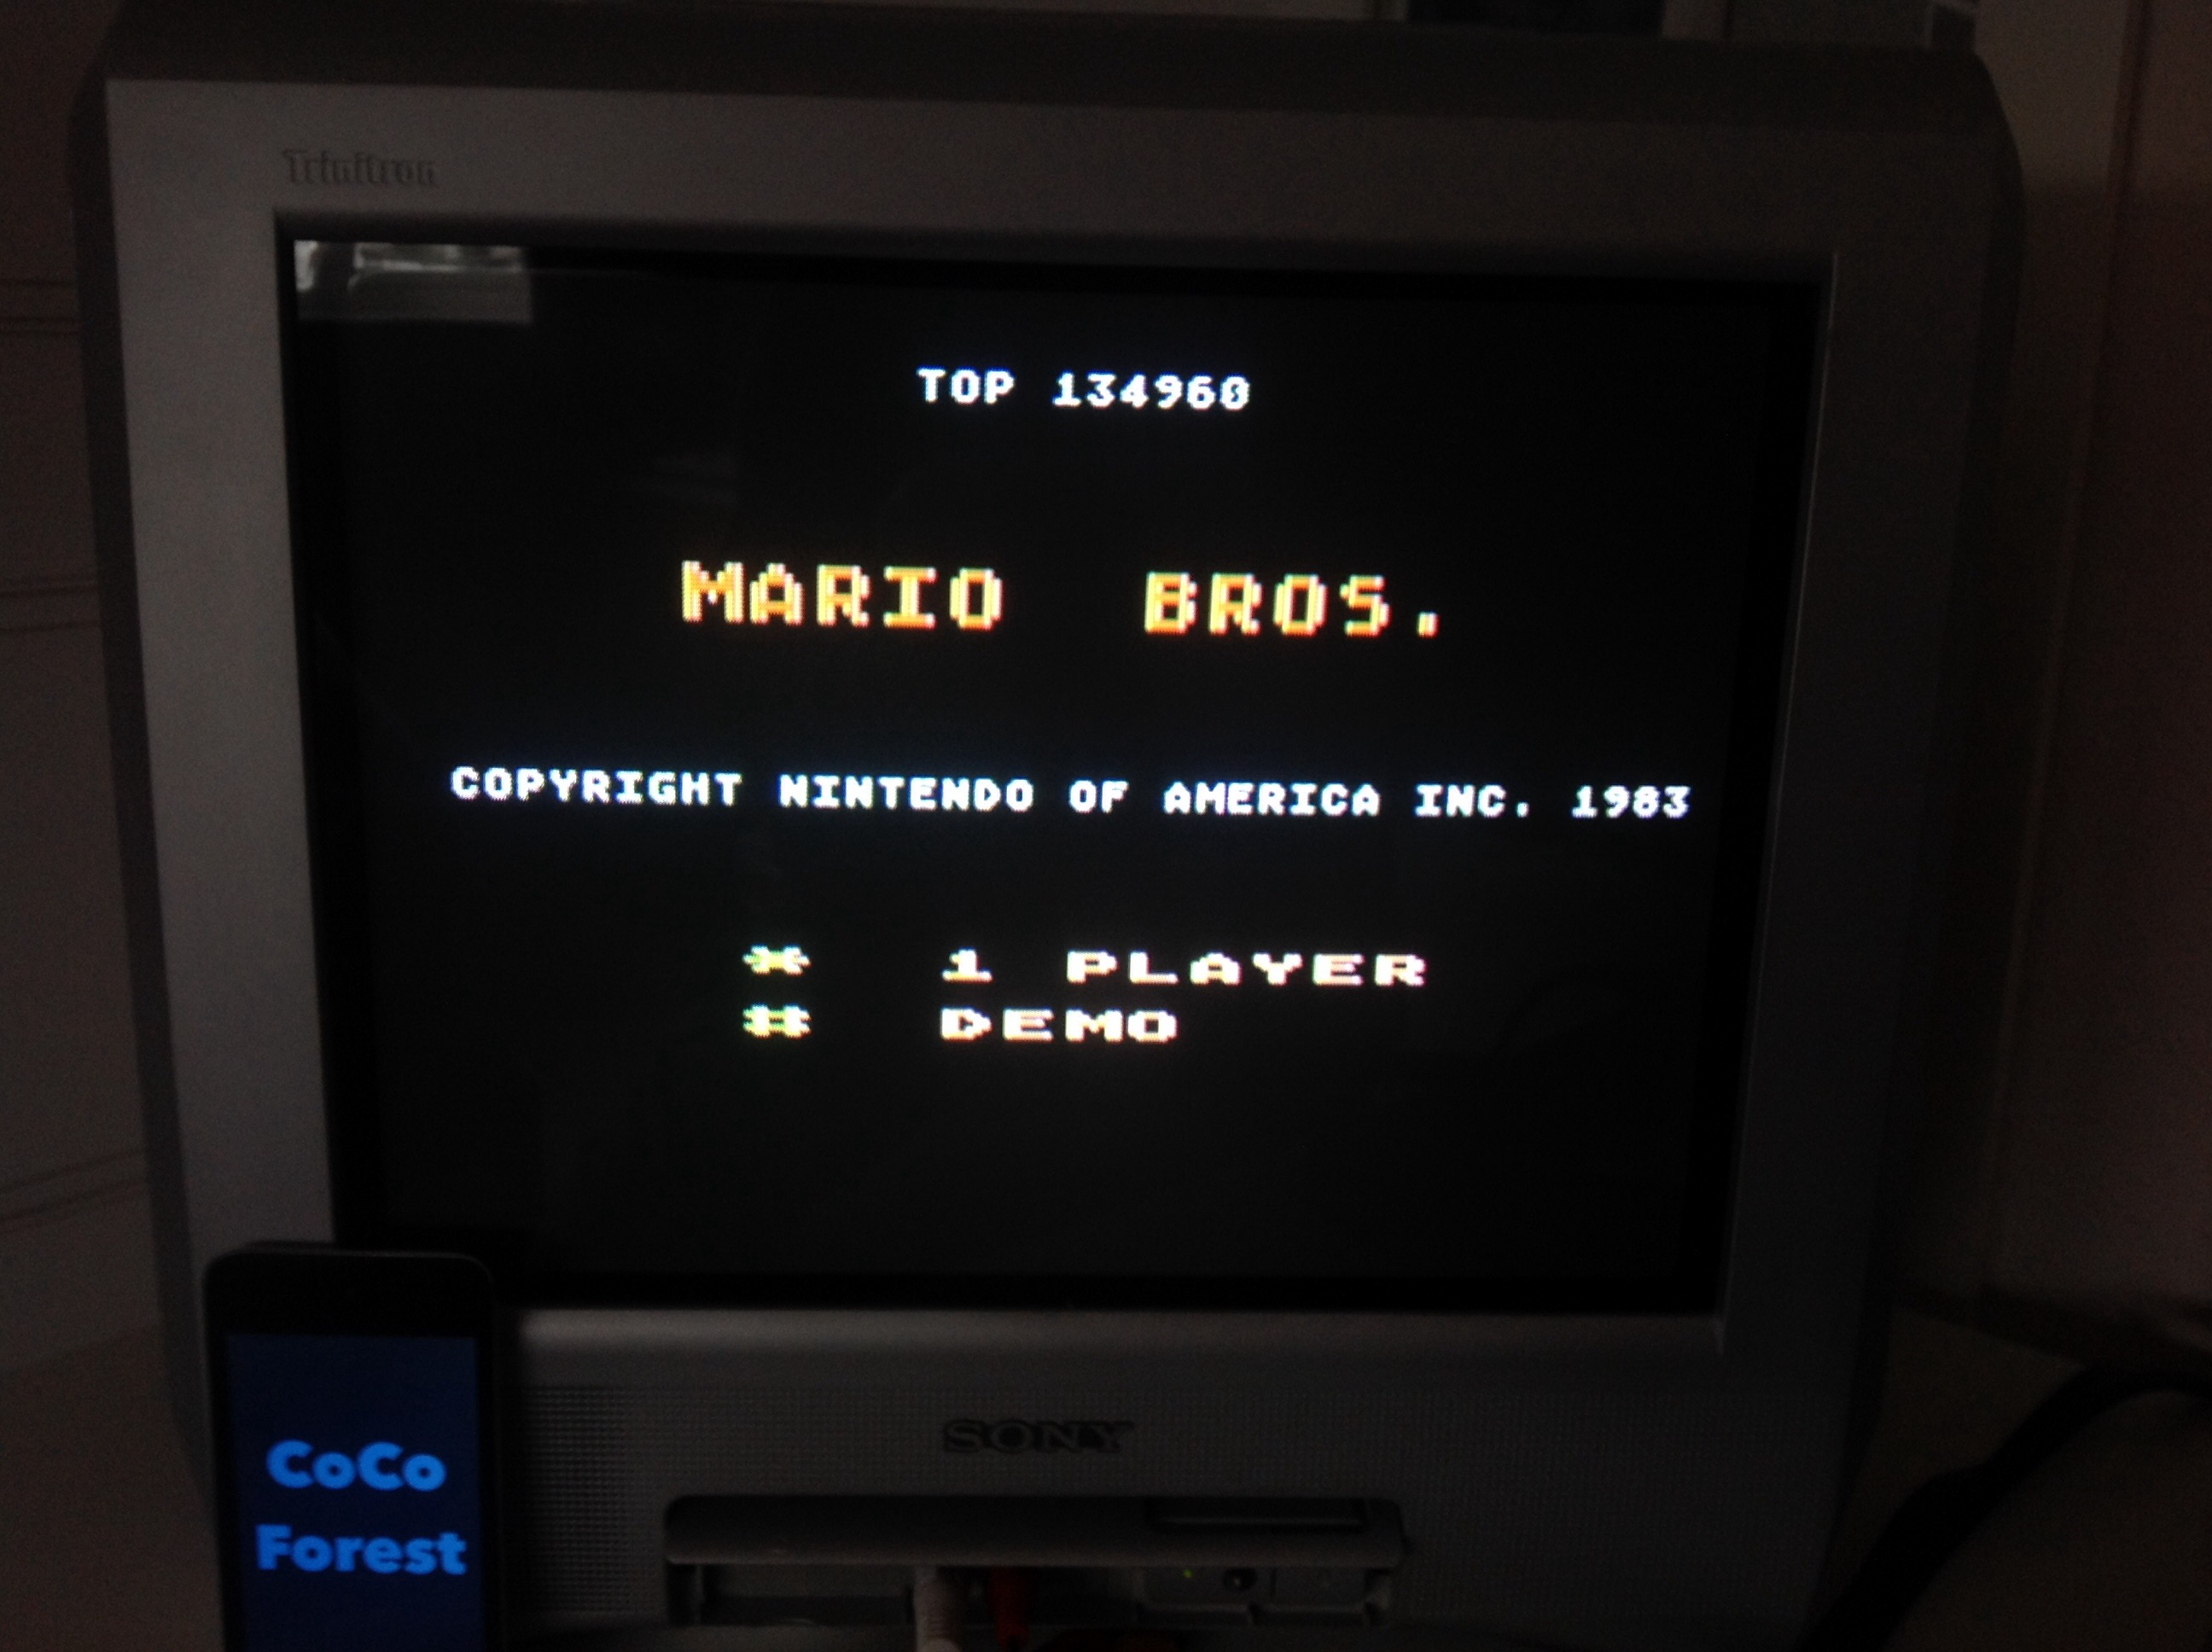 CoCoForest: Mario Bros (Atari 5200) 134,960 points on 2015-02-07 05:12:19